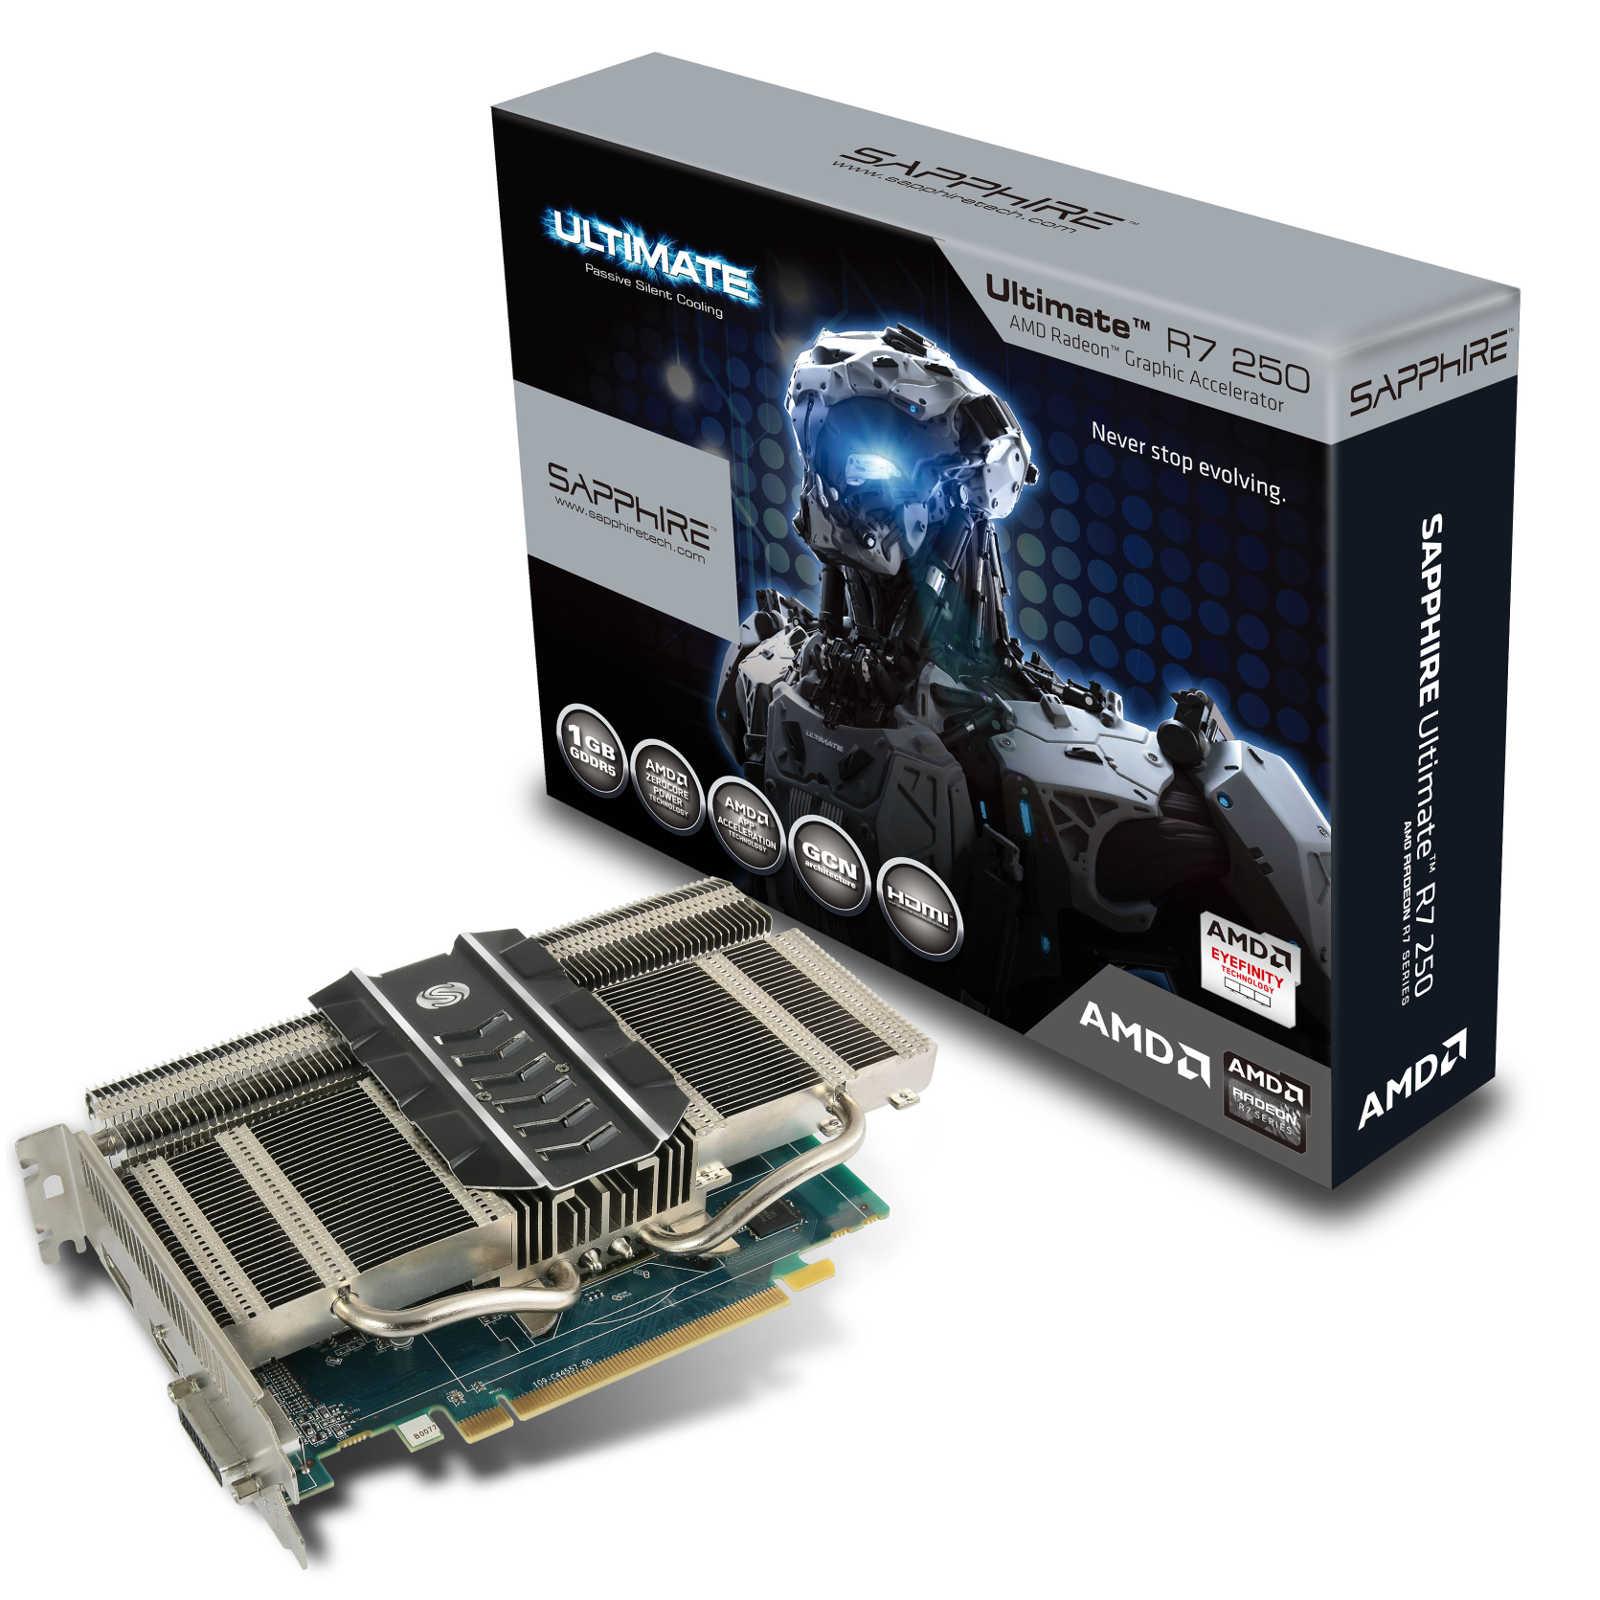 Carte graphique Sapphire Radeon Ultimate R7 250 1G GDDR5 1 Go HDMI/DVI/DisplayPort - PCI Express (AMD Radeon R7 250)